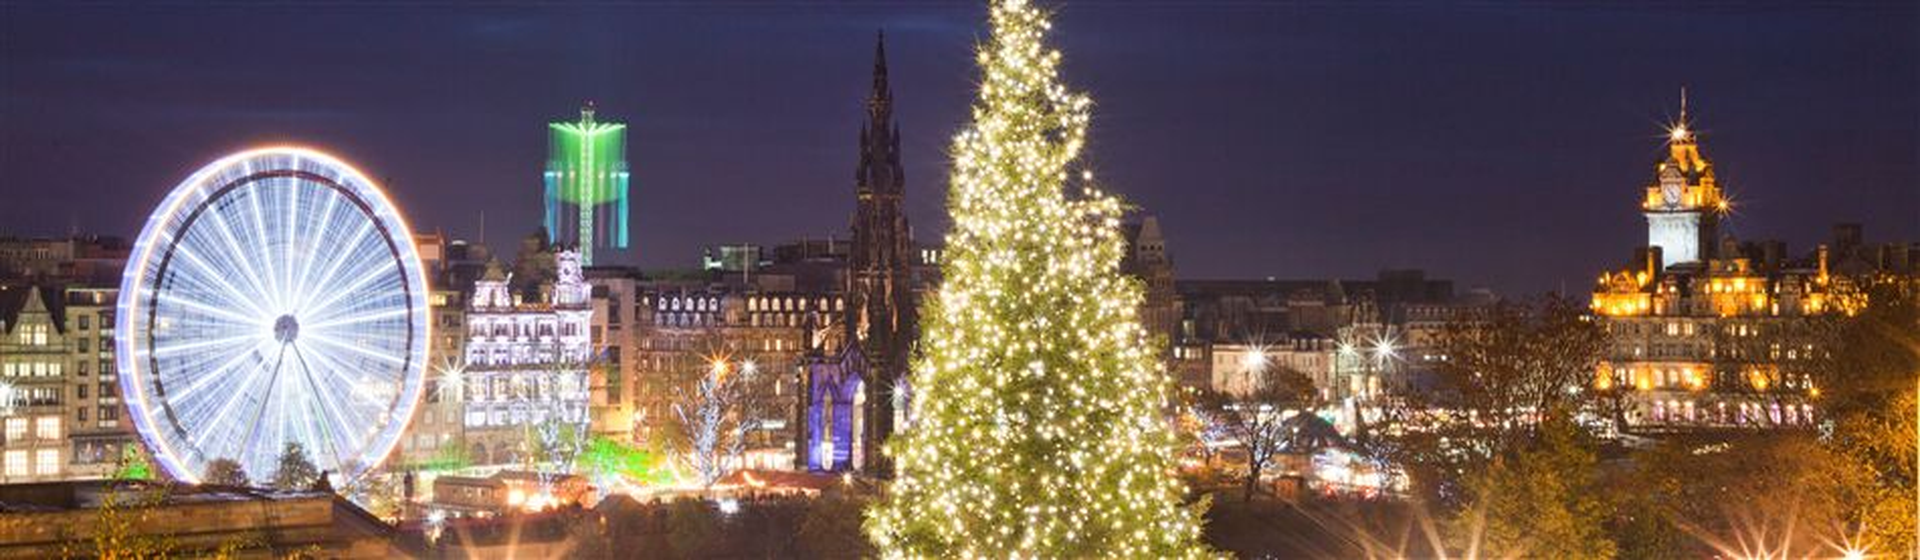 Loch Lomond & Edinburgh Christmas Market